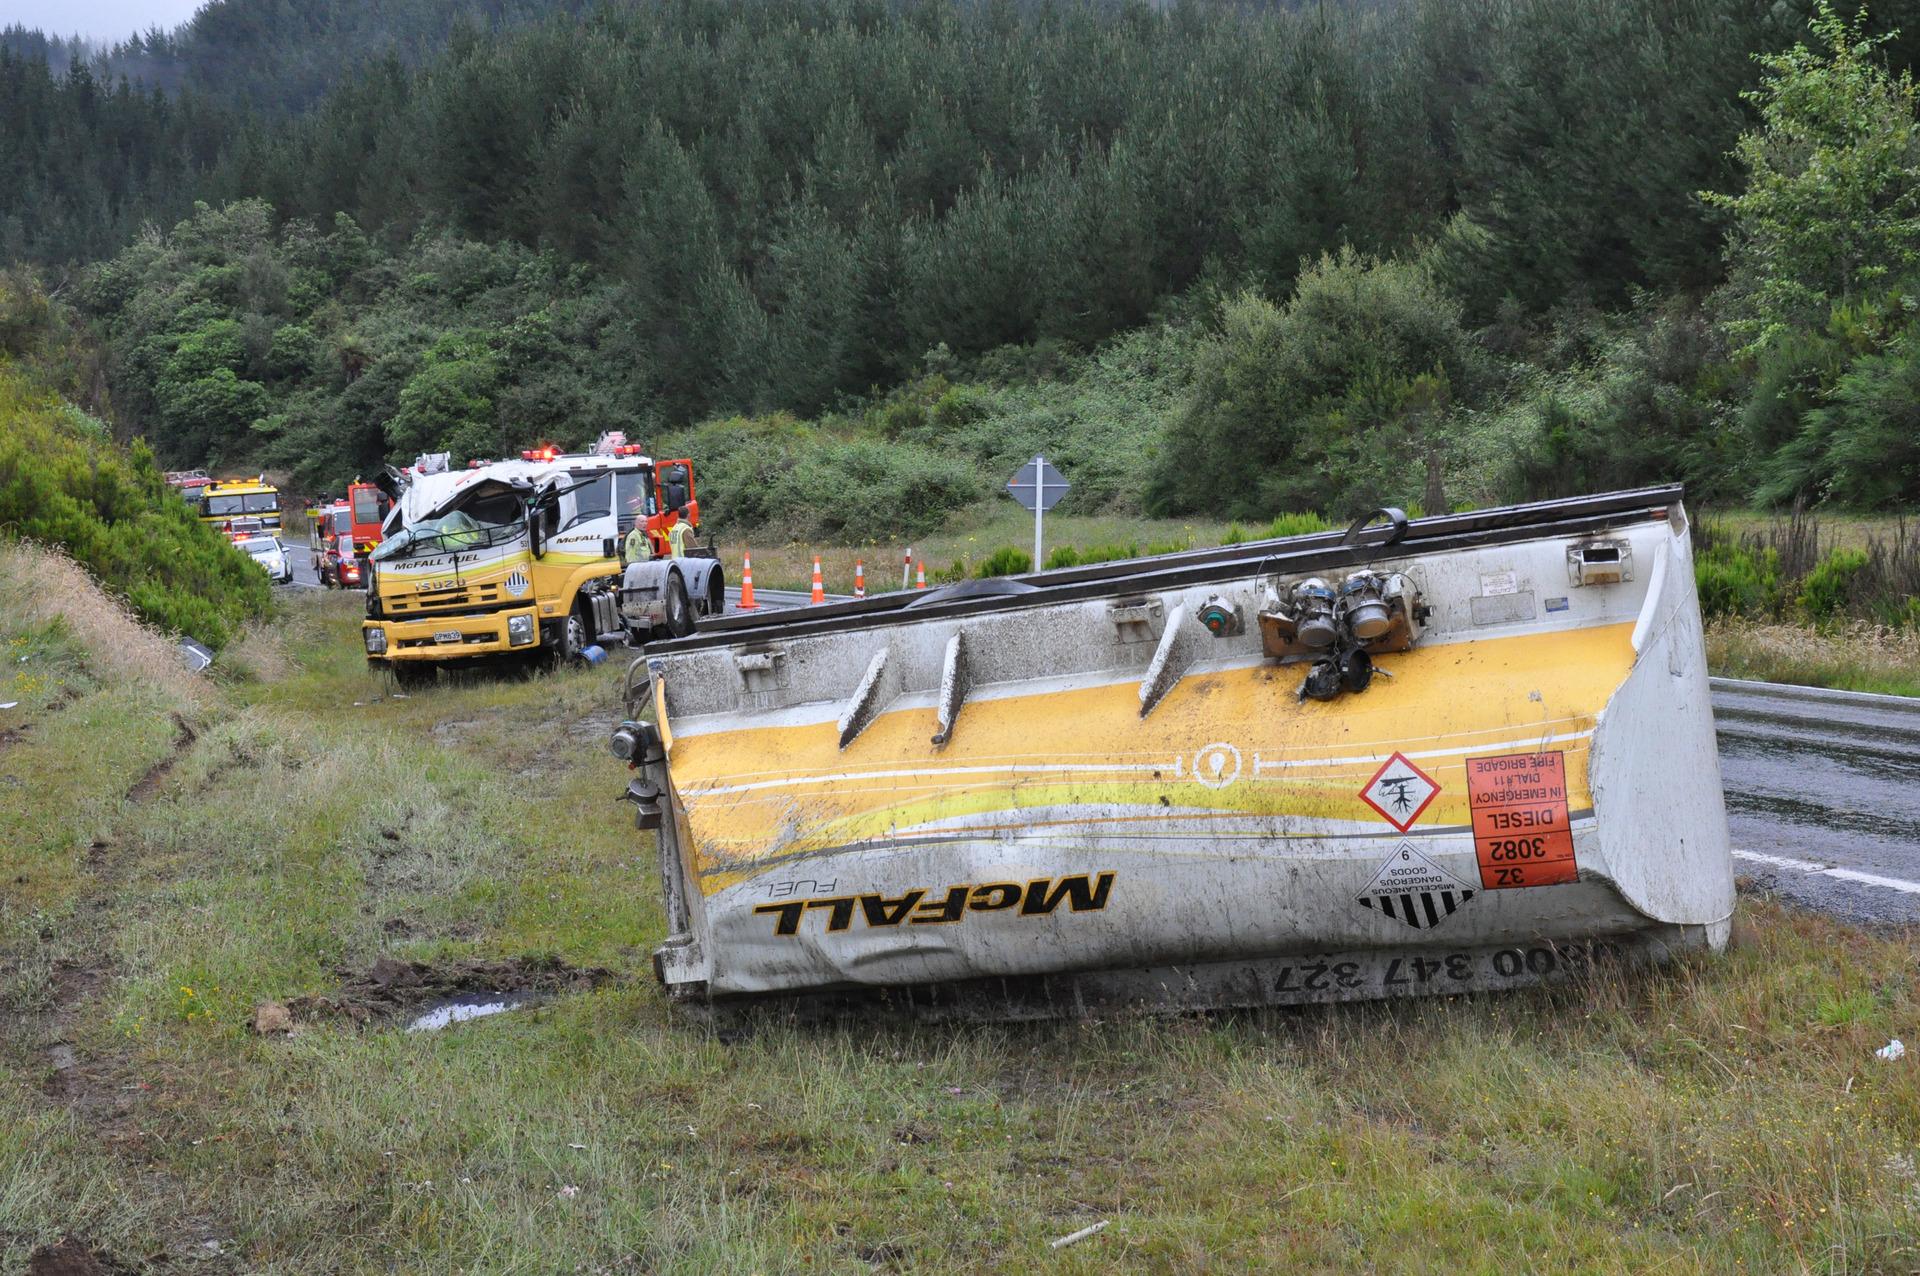 SH 1 reopens after petrol tanker rolls in Ohakuri - NZ Herald